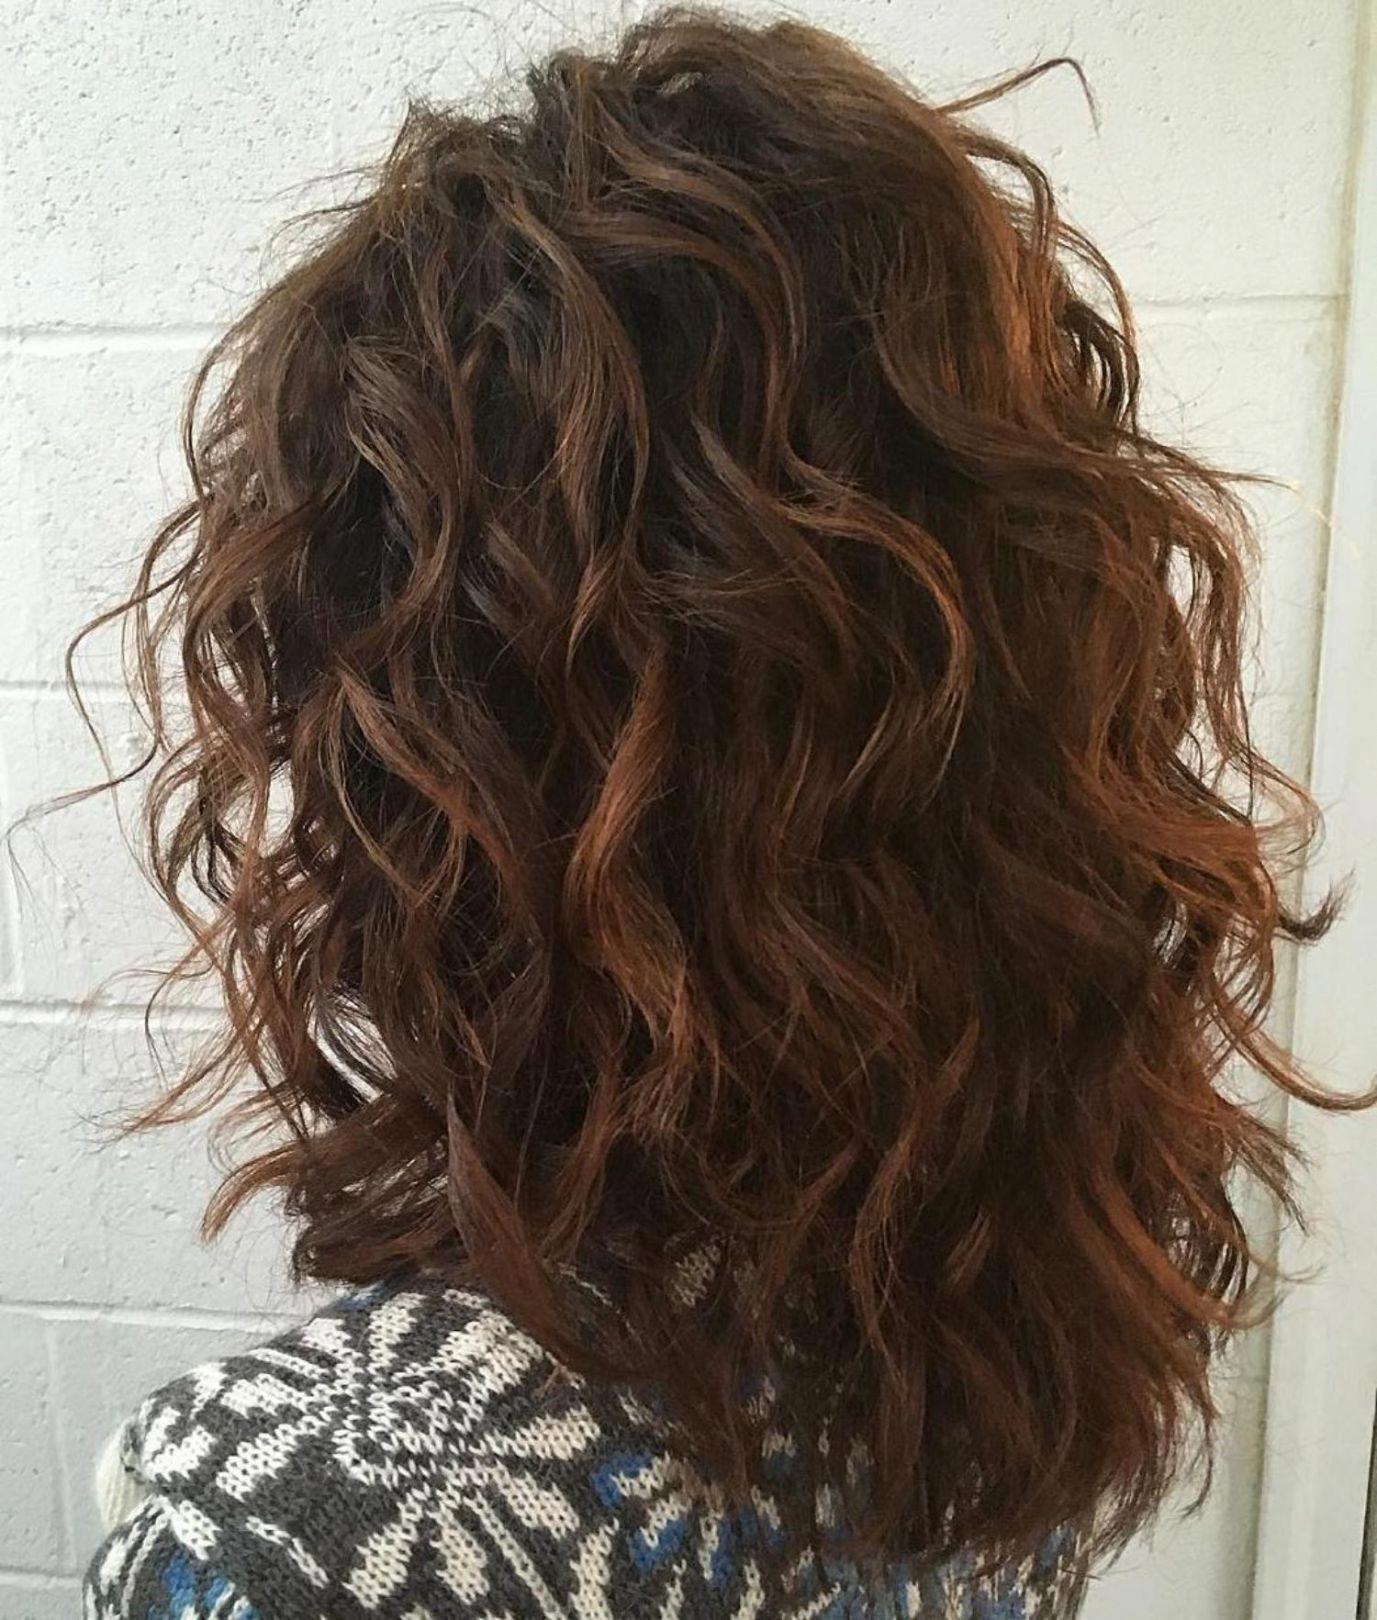 Mid Length Curly Layered Haircut Curlyhaircuts Thick Wavy Hair Natural Wavy Hair Haircut For Thick Hair